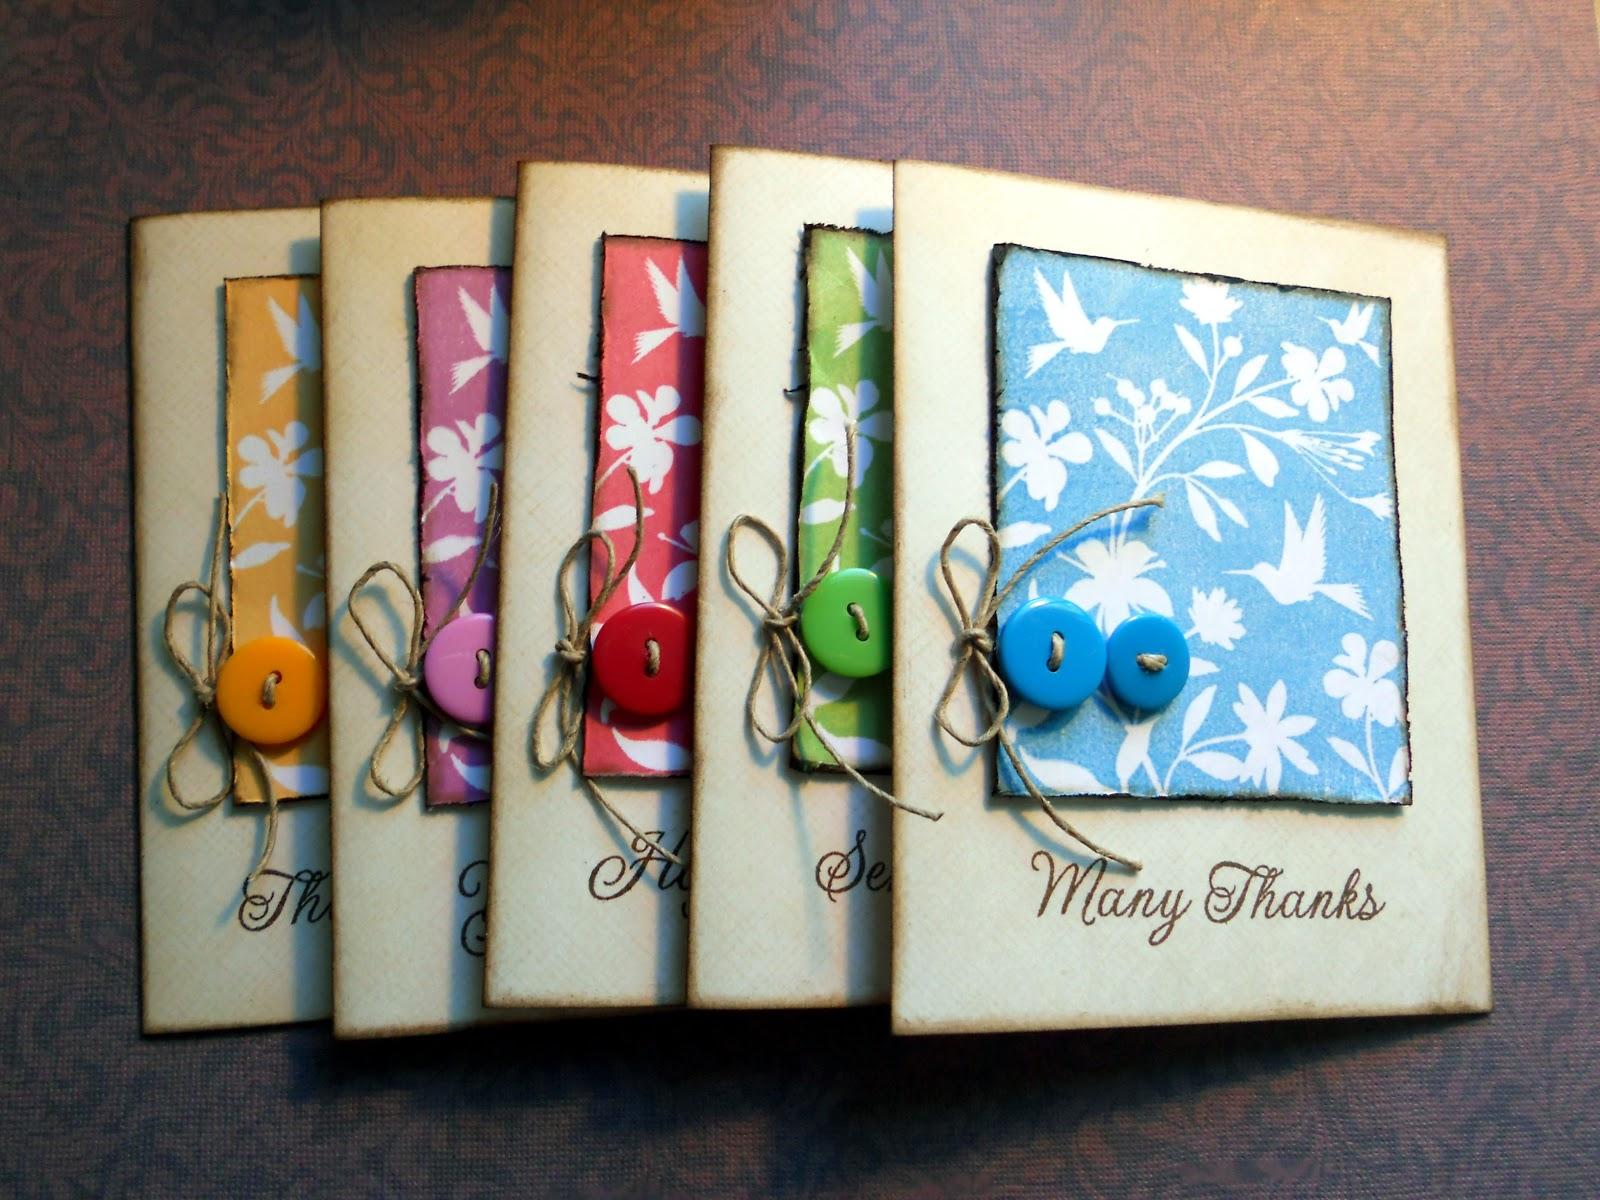 http://disp6194-kellyscraps.blogspot.ca/2011/06/etsy-inspired-card-set.html